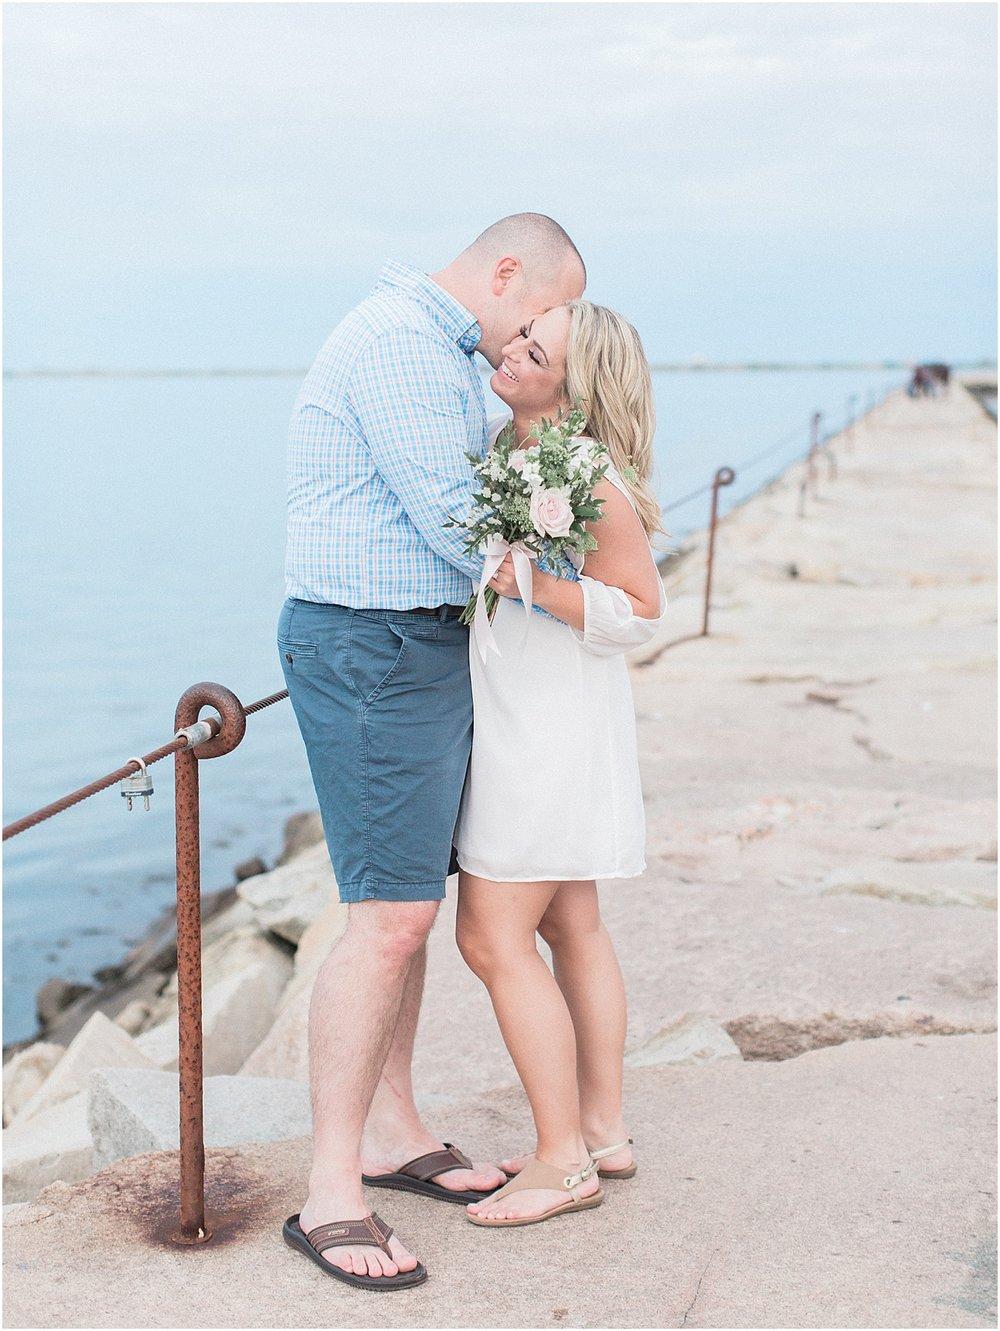 amy_erik_plymouth_brewster_gardens_jetty_champagne_cape_cod_boston_wedding_photographer_meredith_jane_photography_photo_0781.jpg